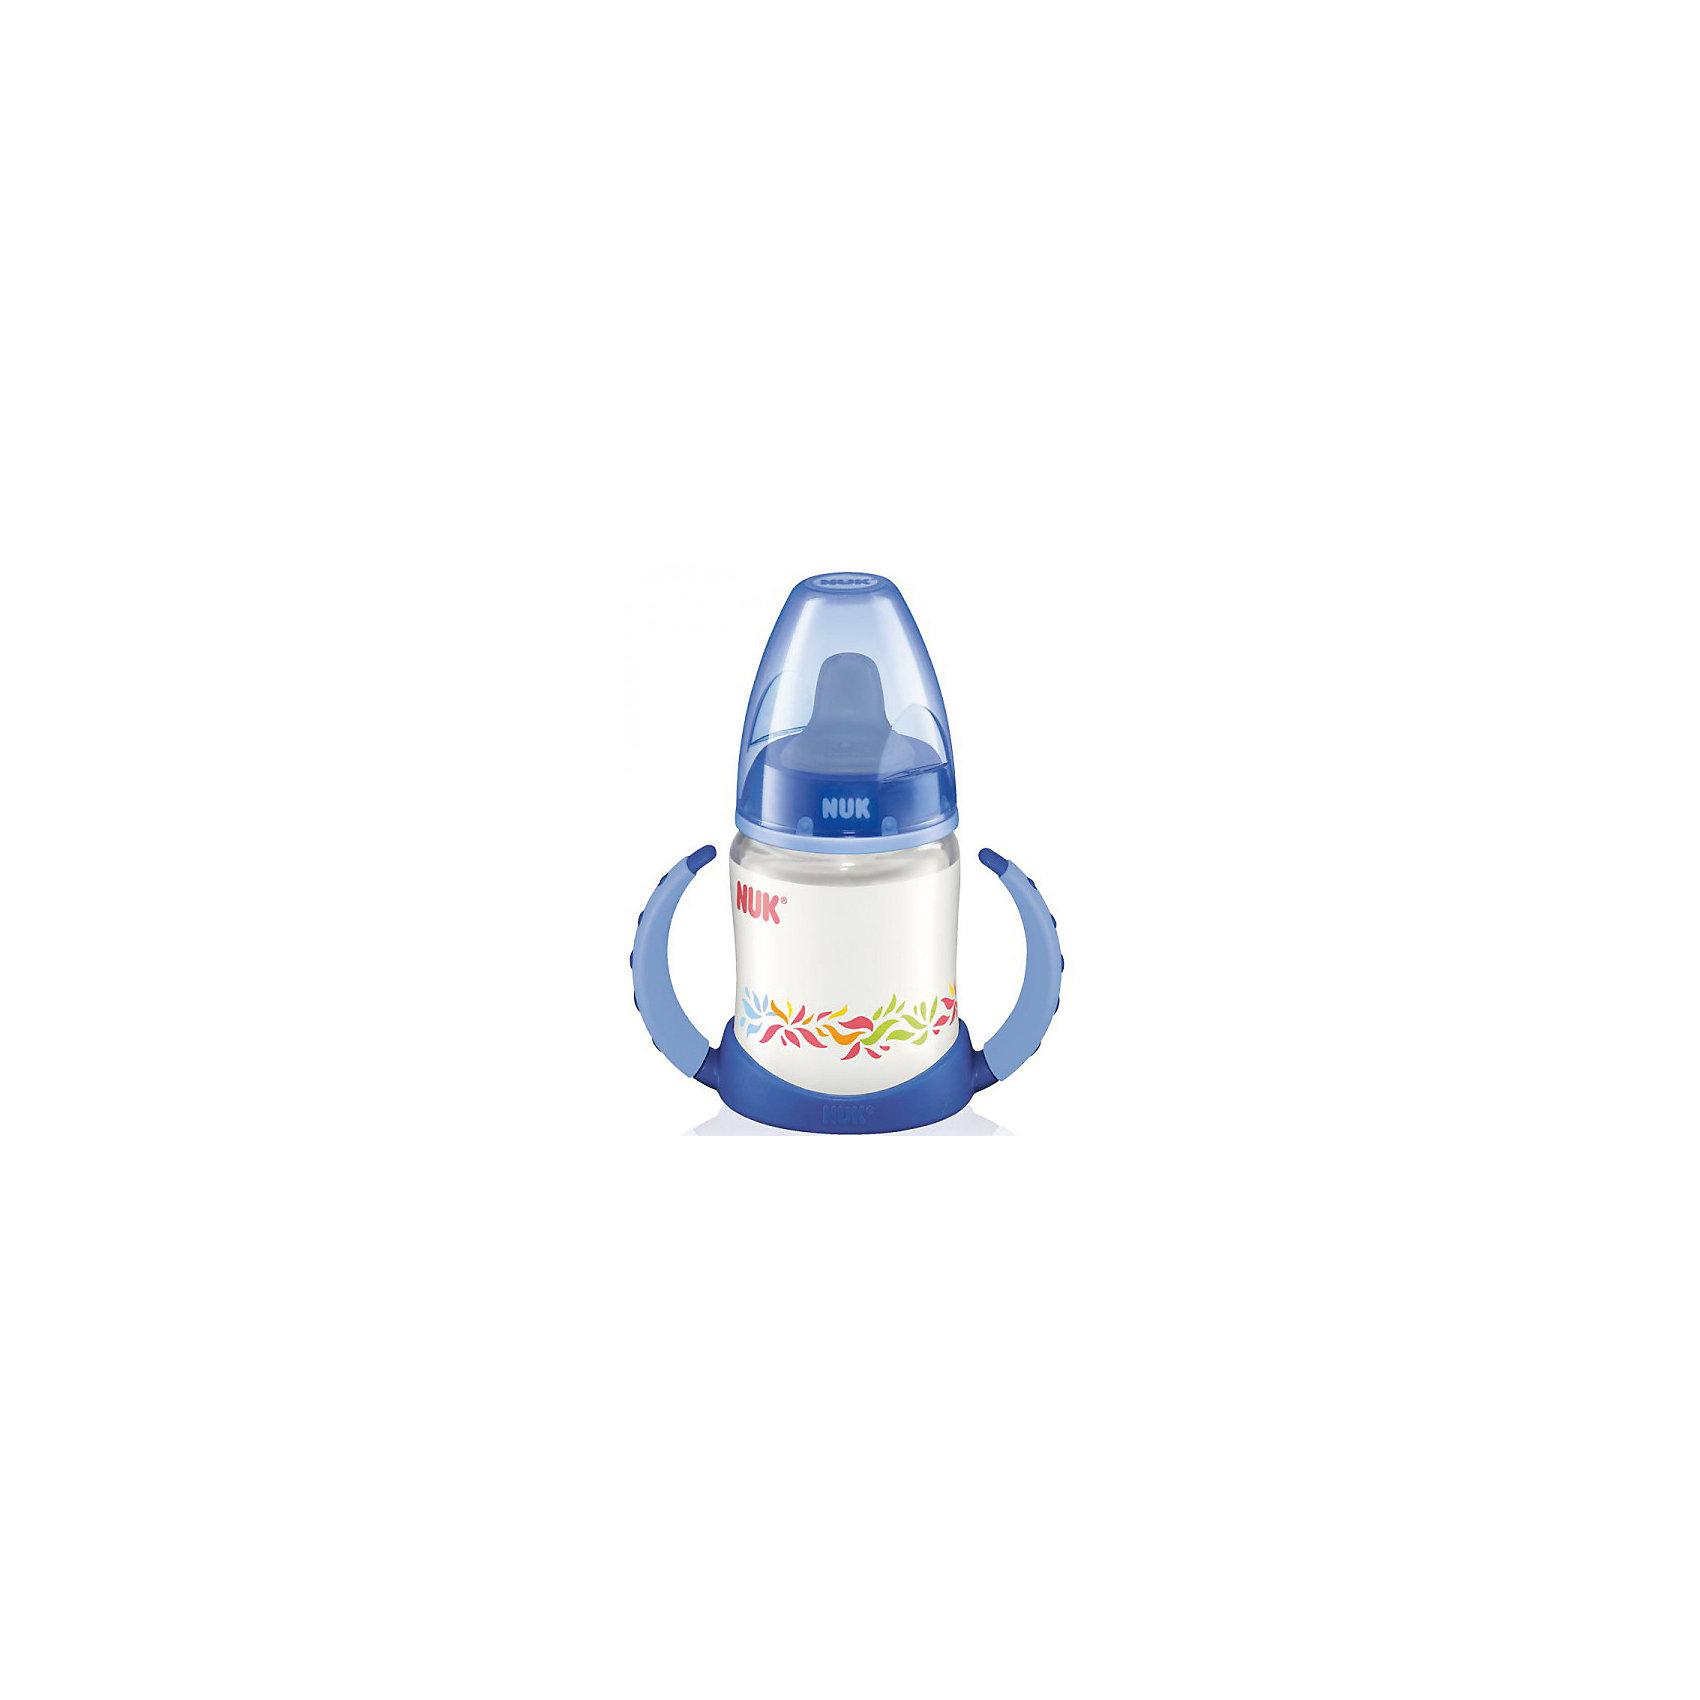 Бутылочка First Choice, 150 мл., NUK, синий